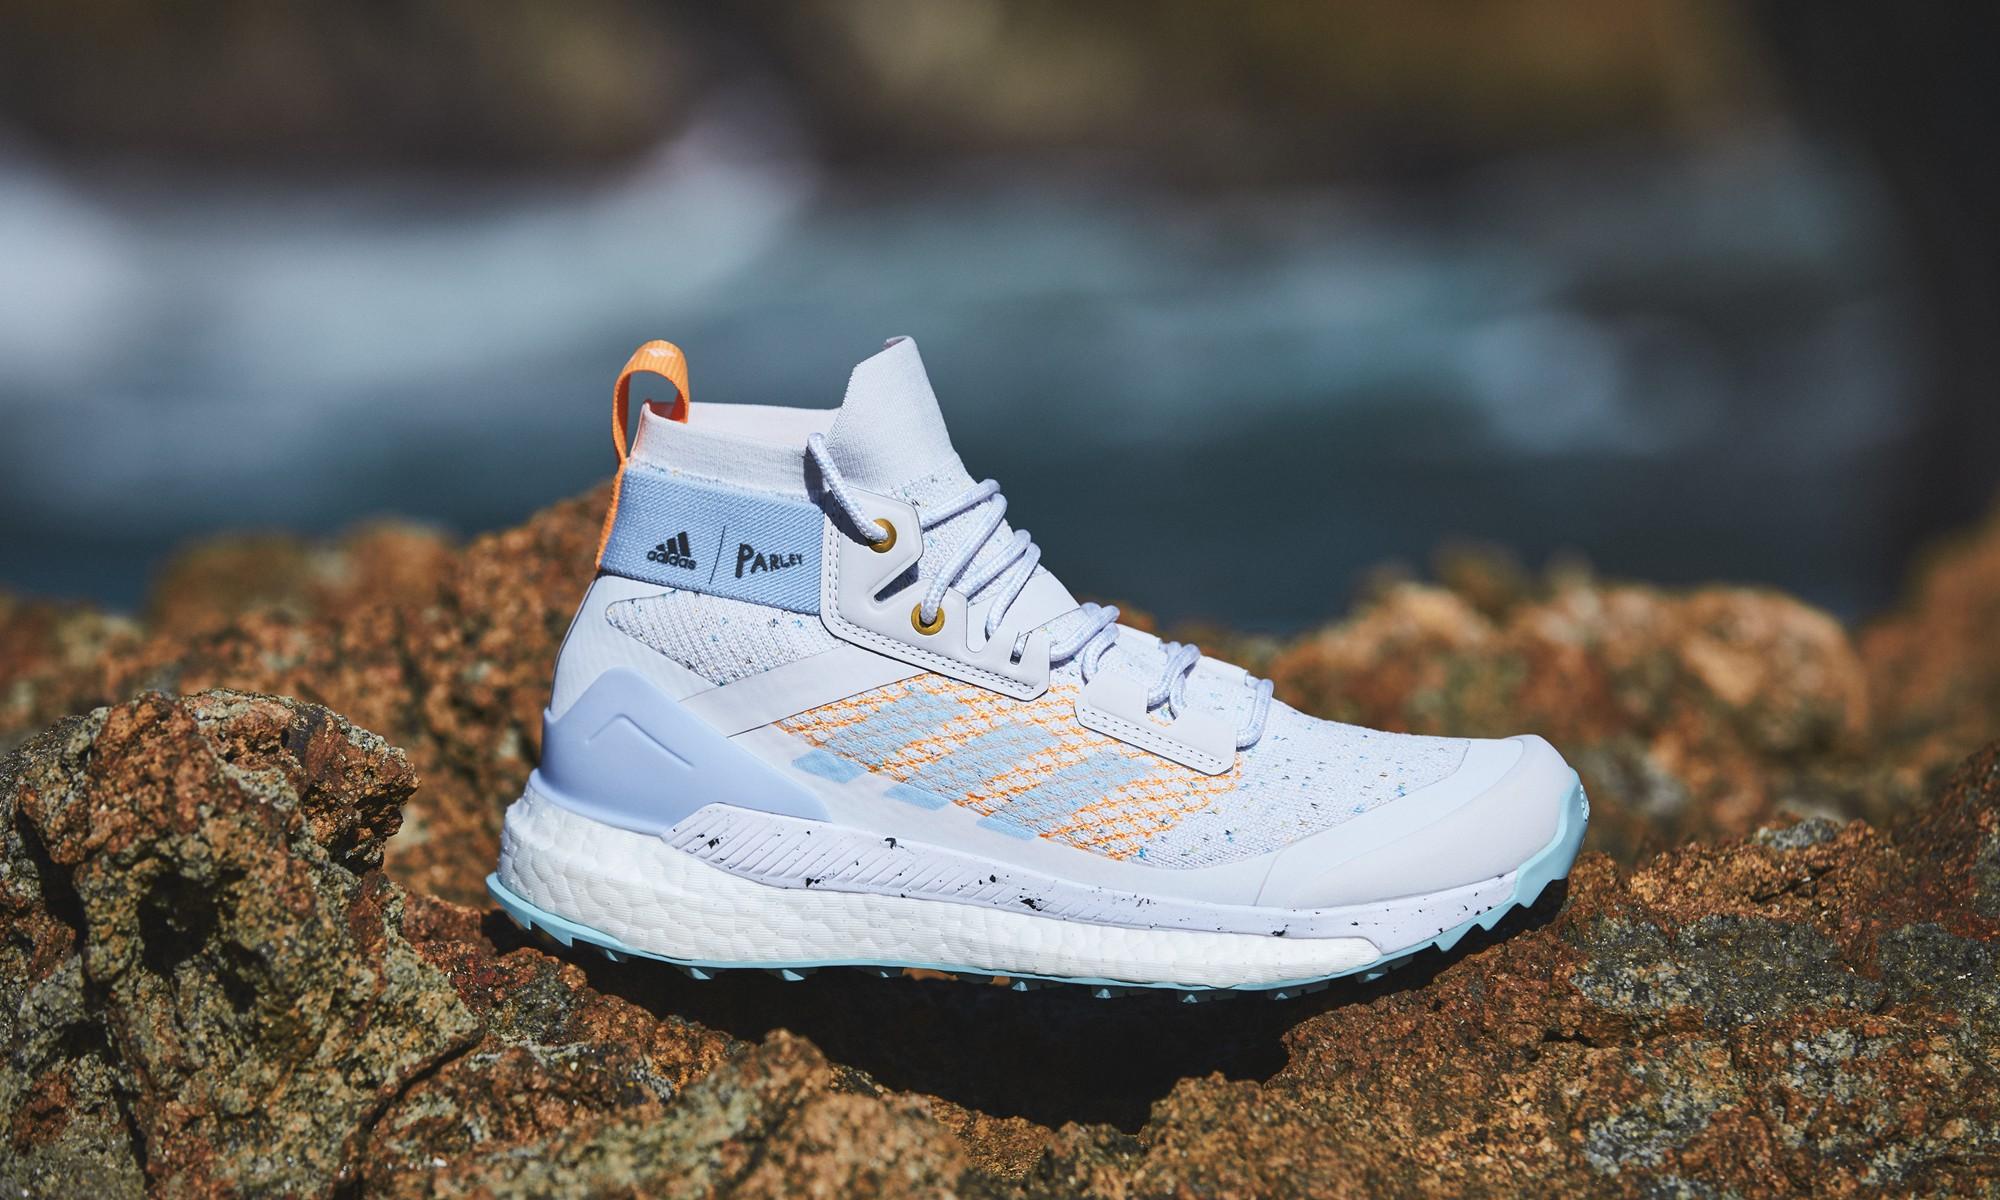 adidas TERREX Free Hiker Parley 海洋再生徒步鞋正式登场